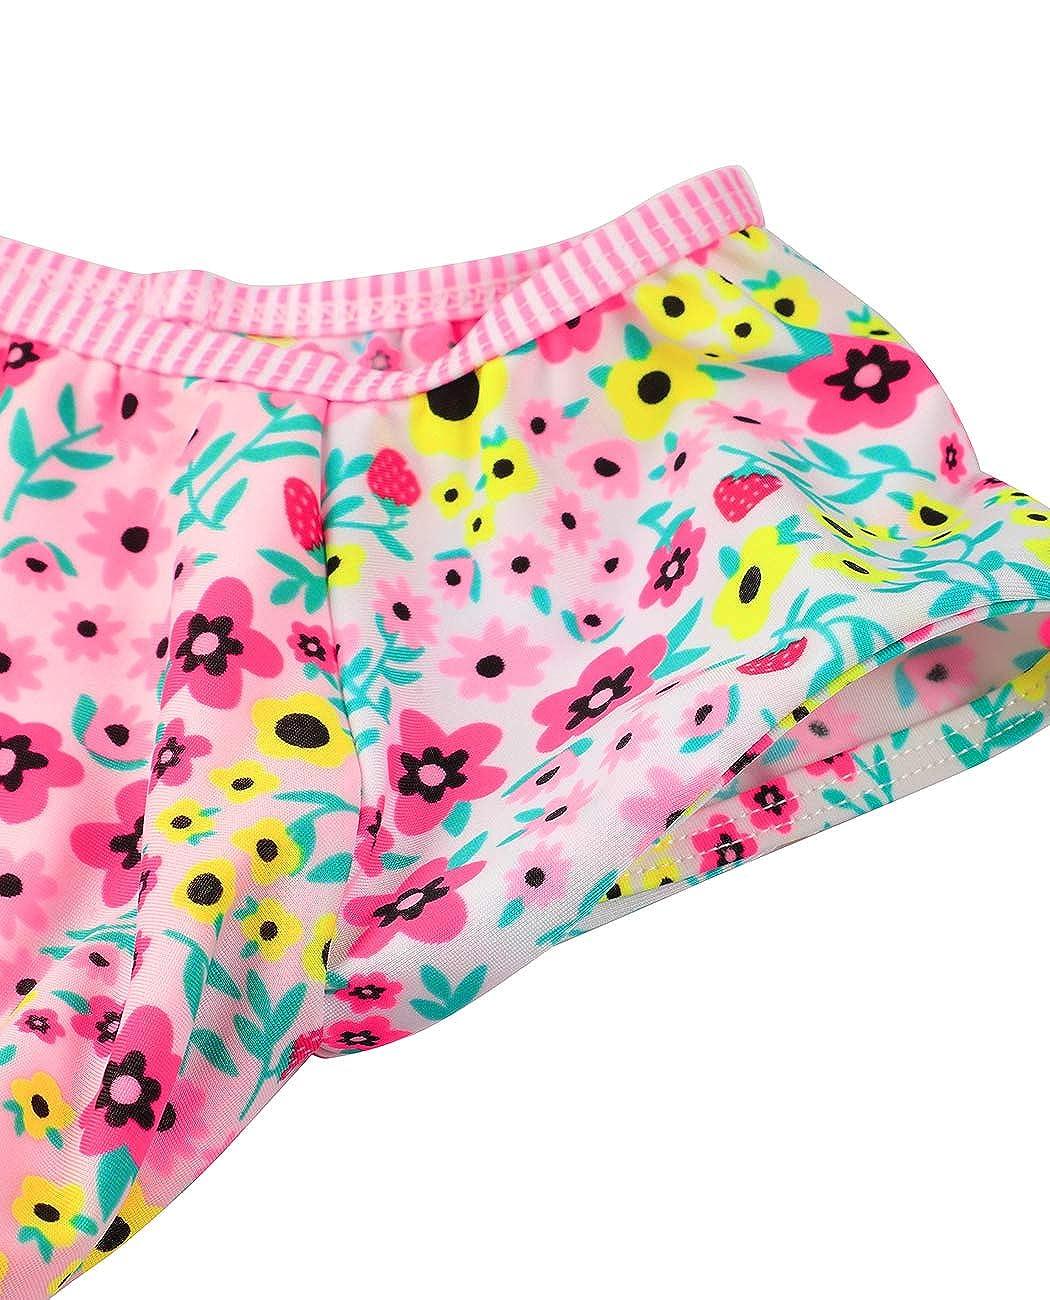 Two Piece Swimsuit Patterned Bathing Suit Short Sleeves Swimming Costume iDrawl Girls Tankini Swimwear